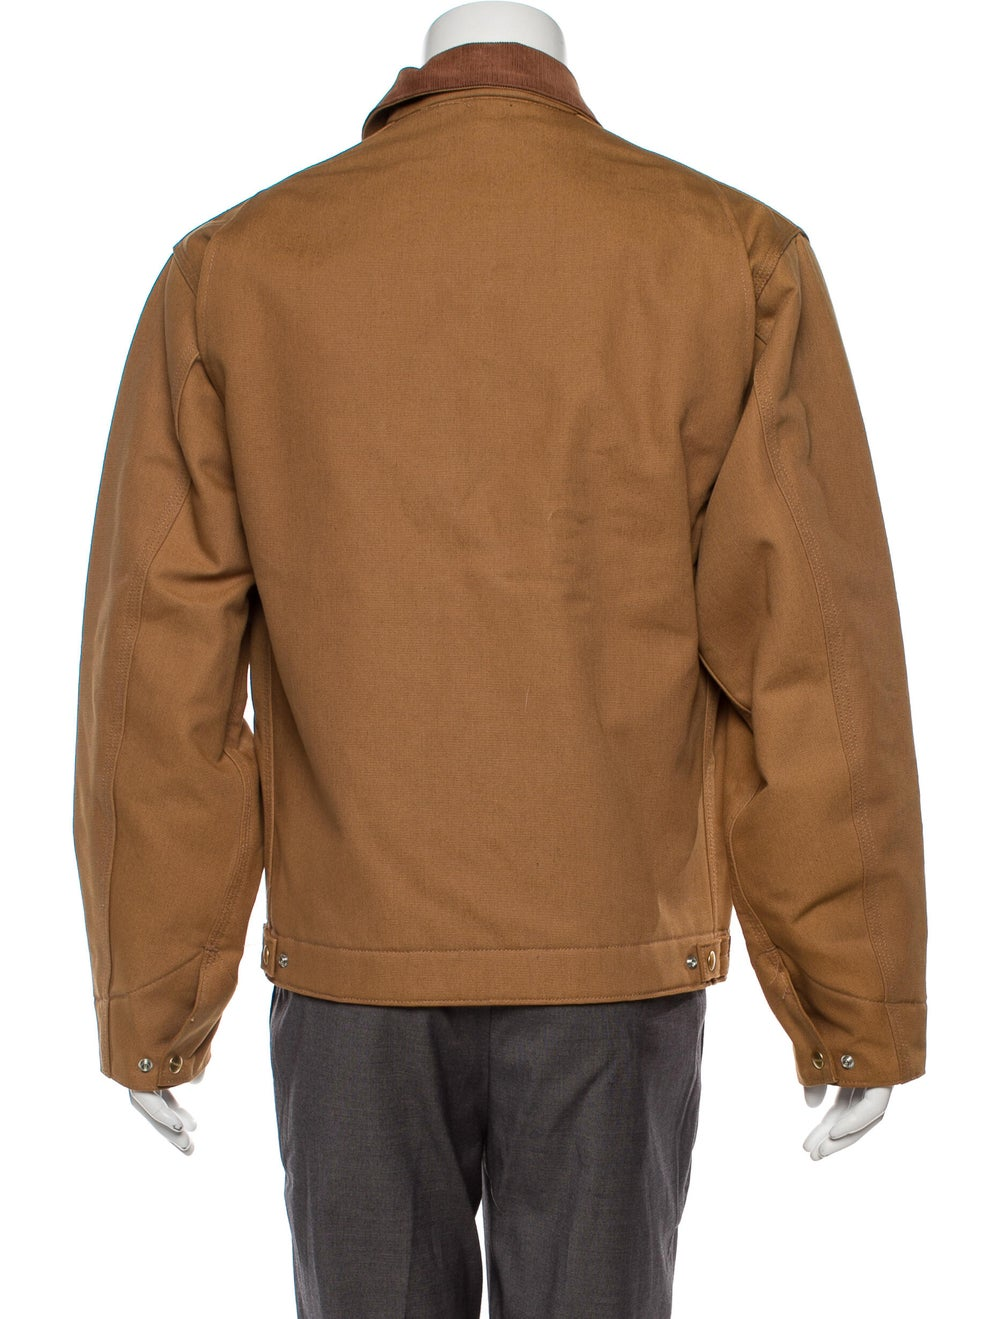 Carhartt Jacket - image 3